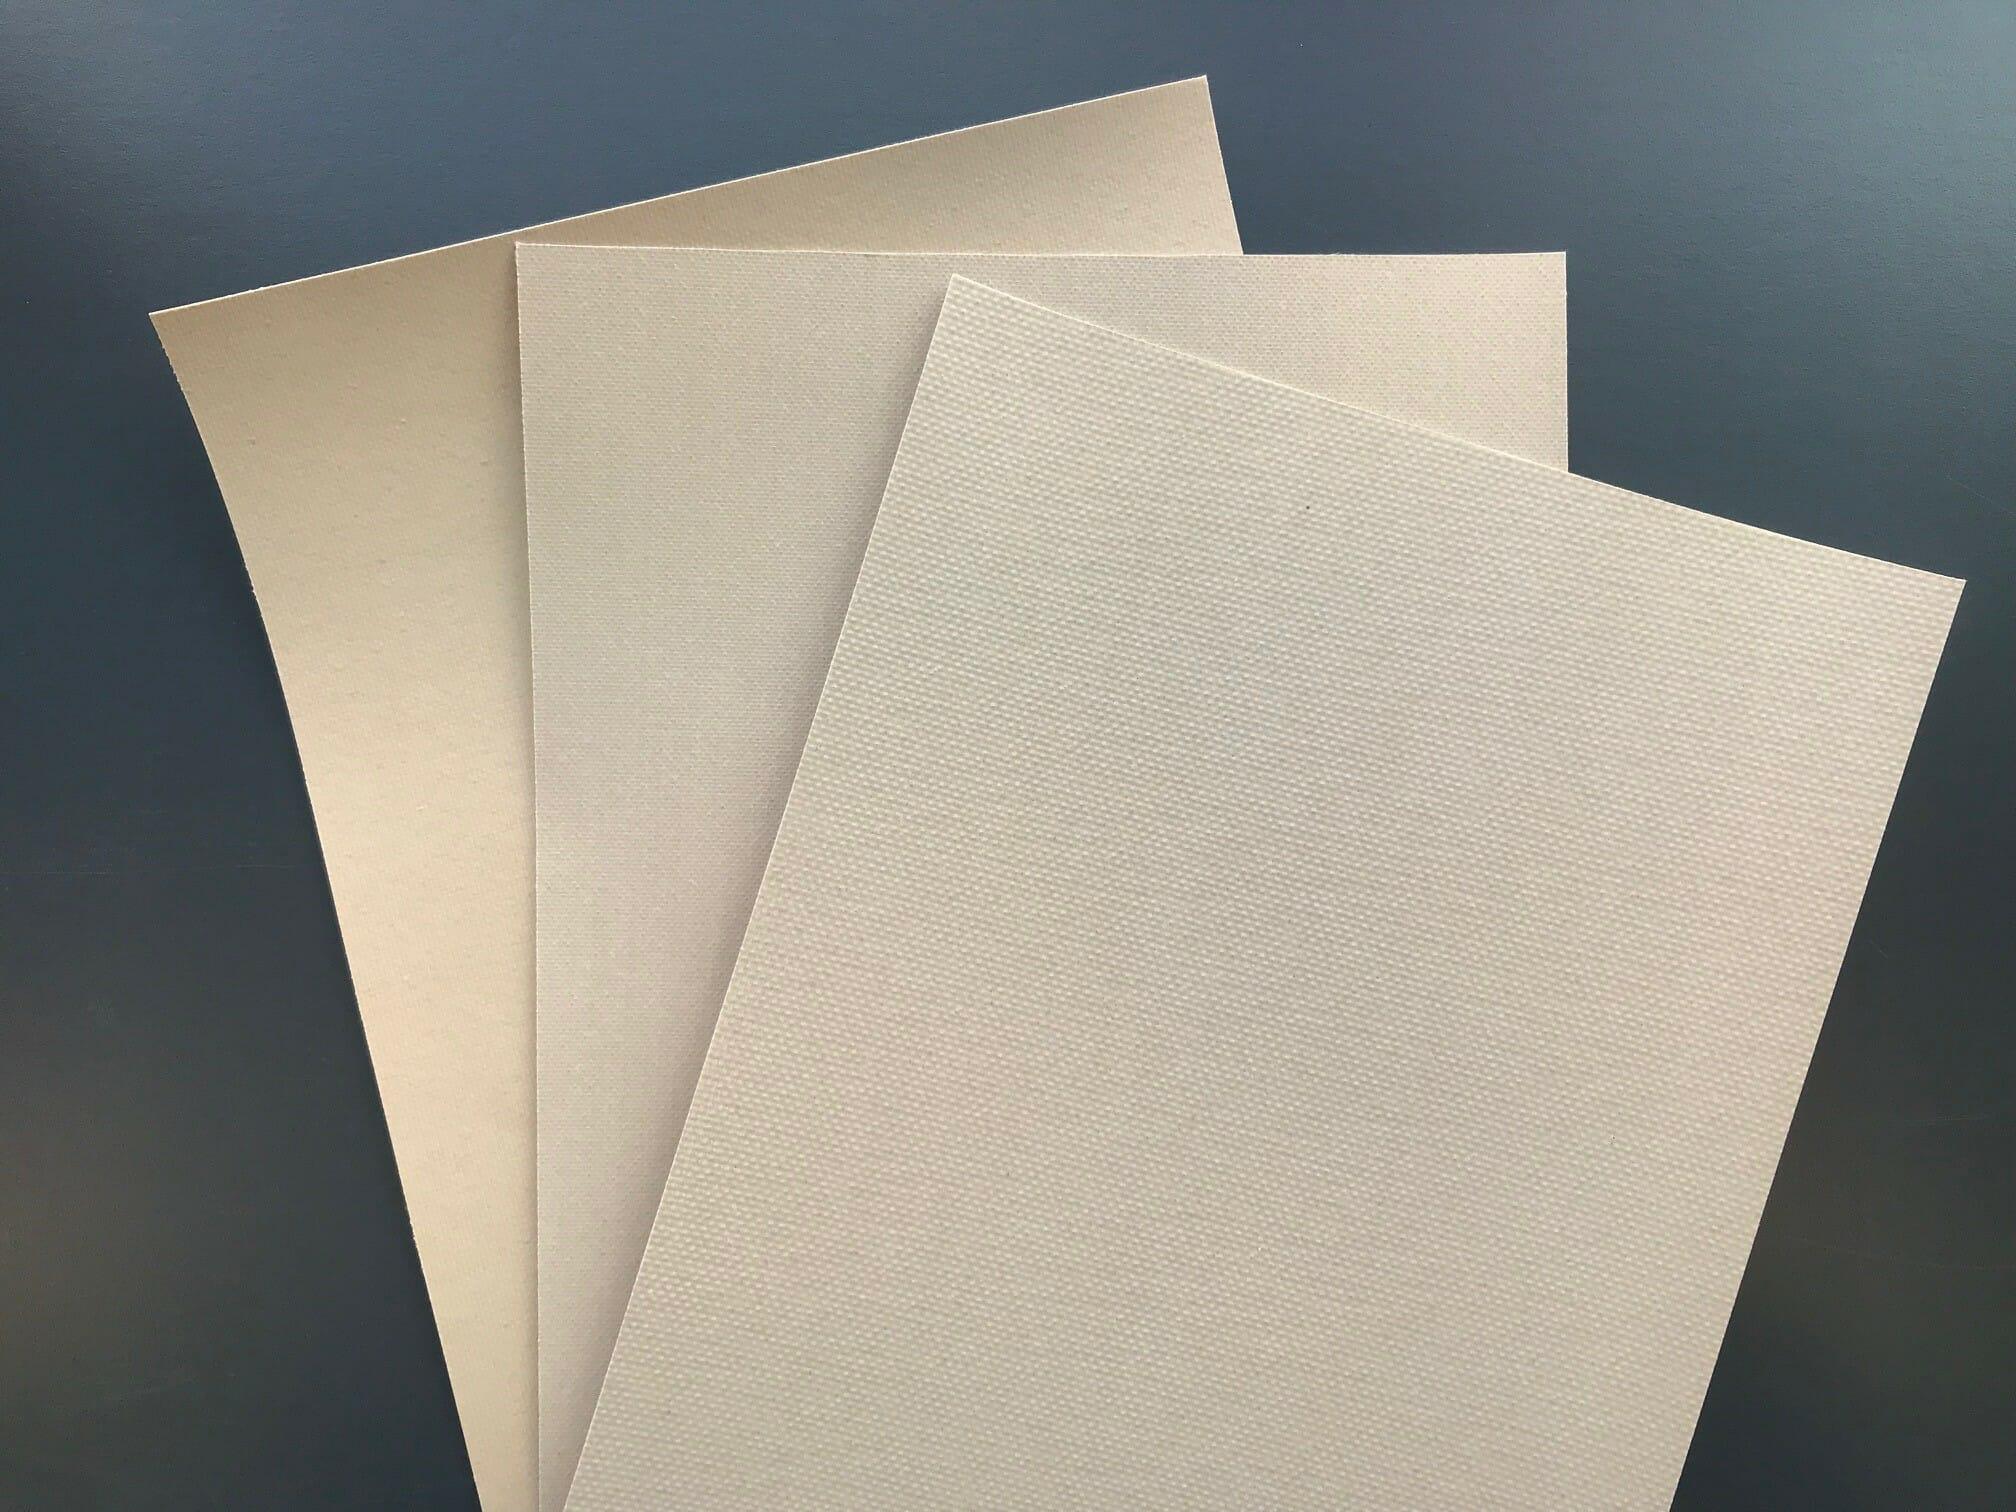 Beige PTFE fabric